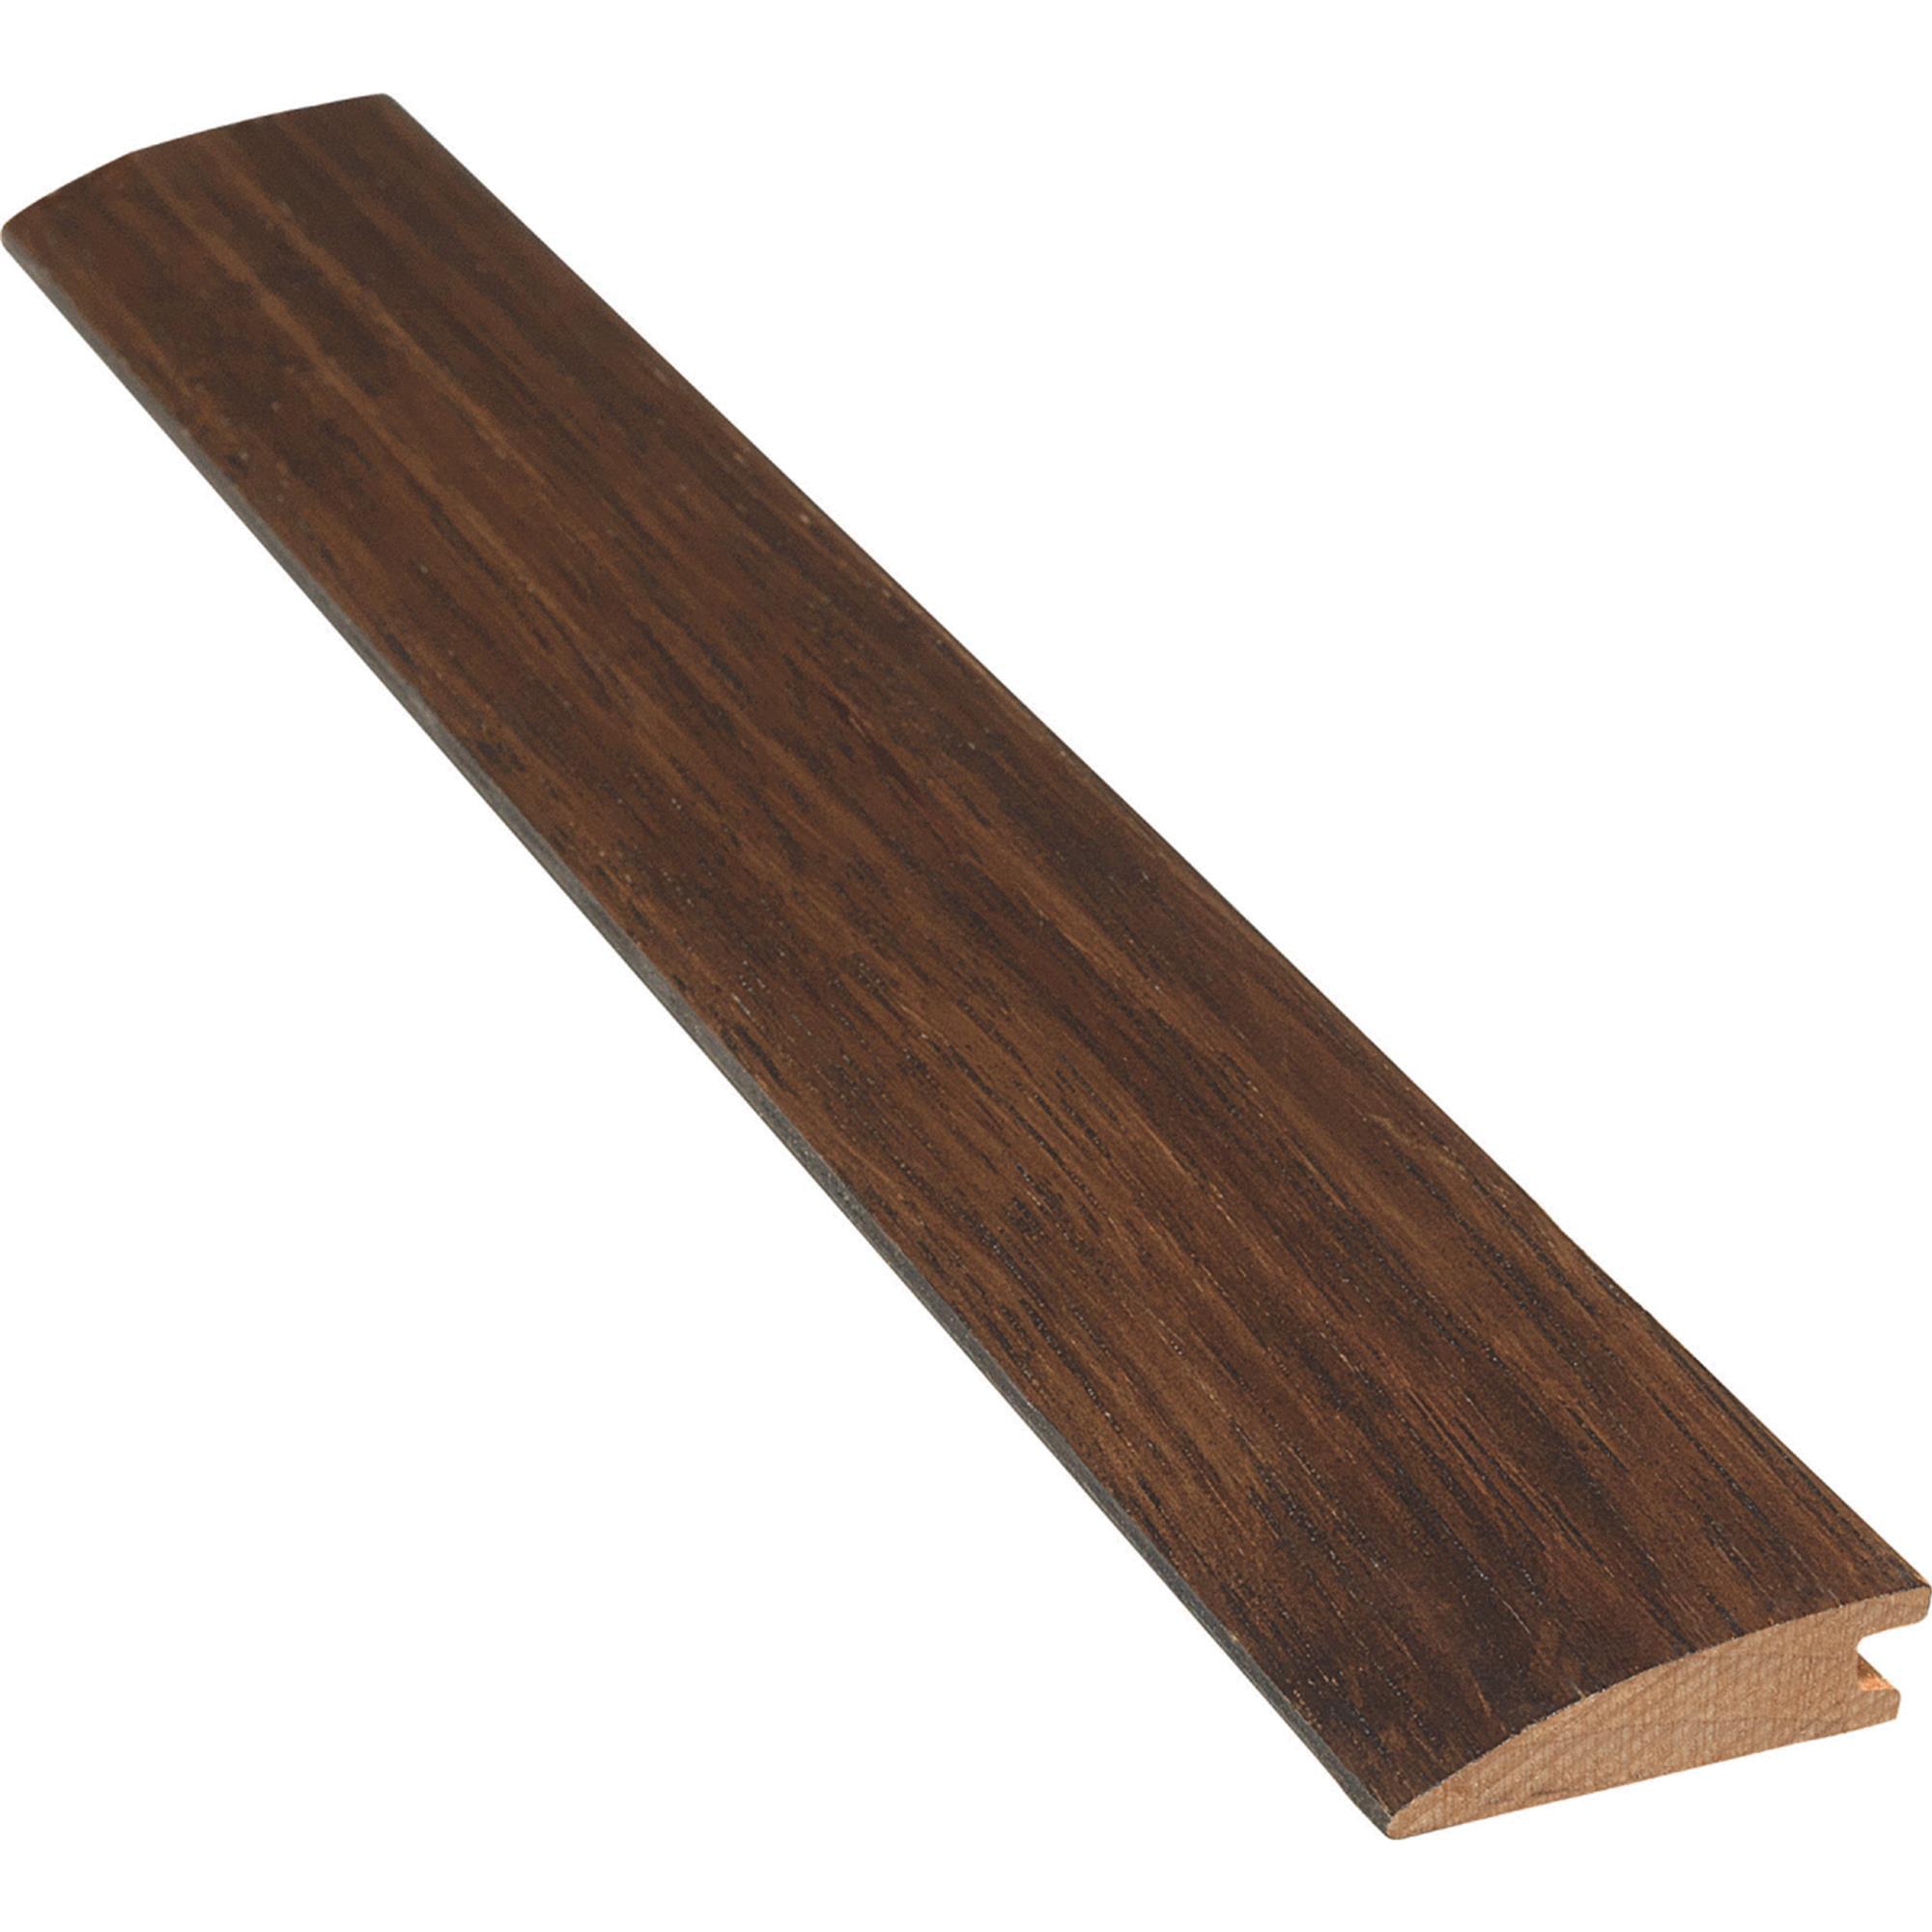 Mohawk Wood Floor Reducer Molding